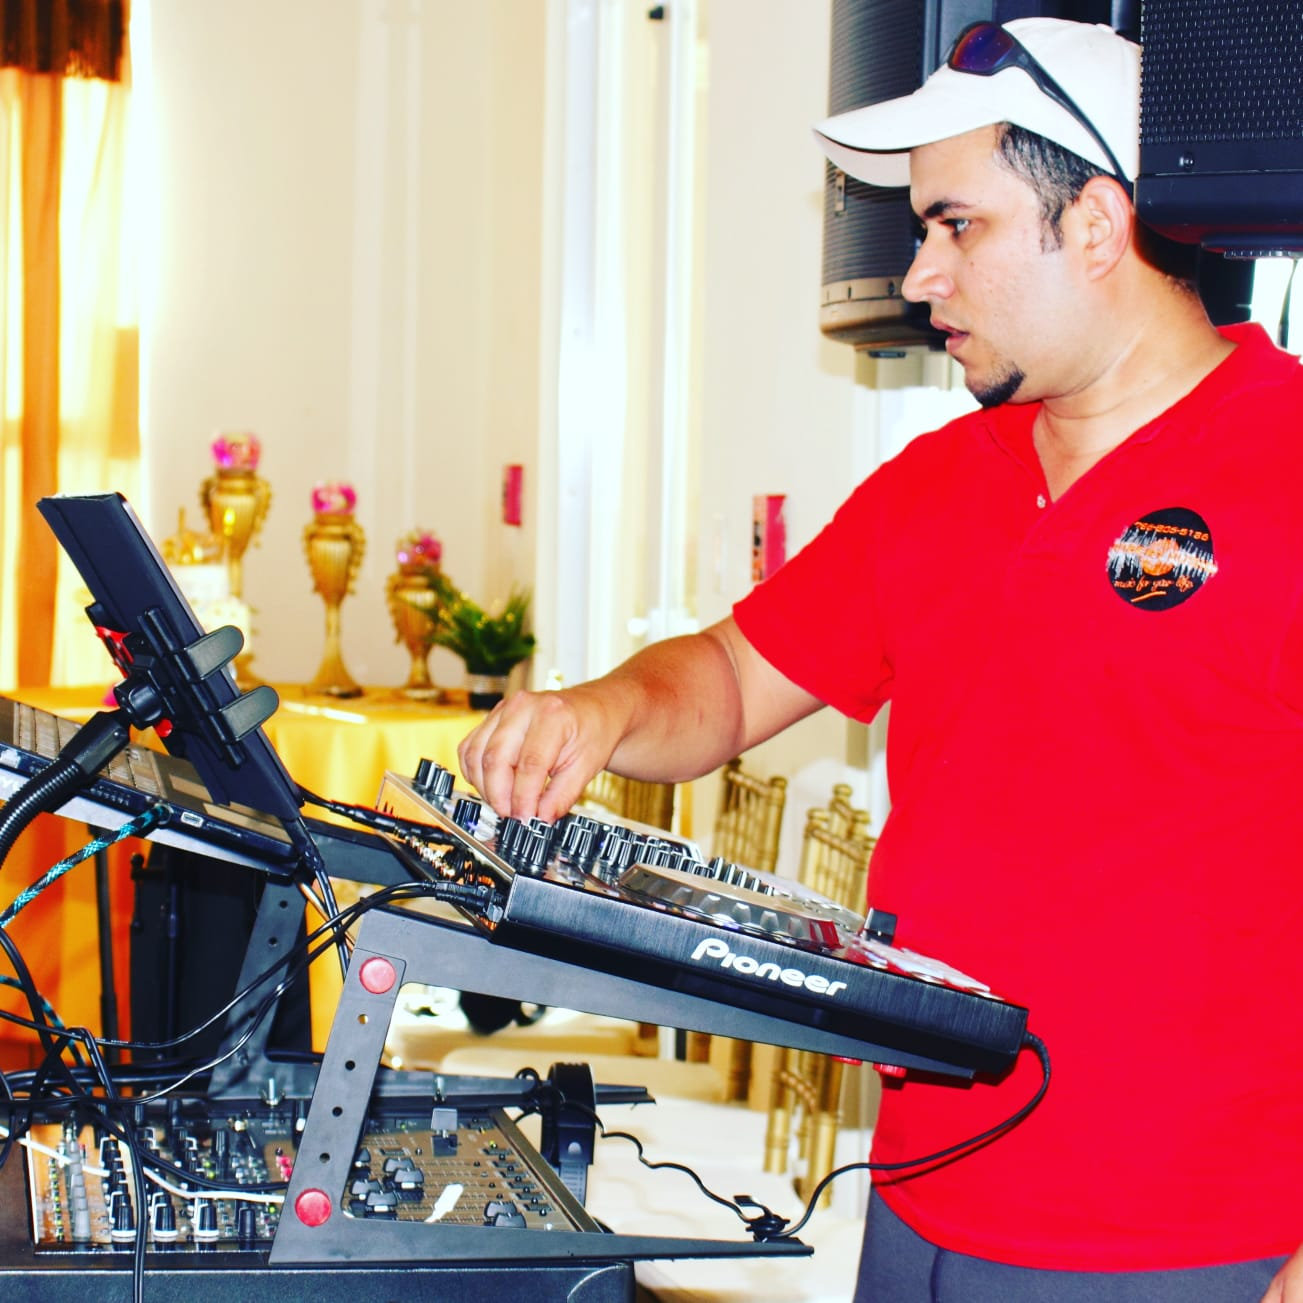 DJ SERVICE WITH LUXURY SET UP